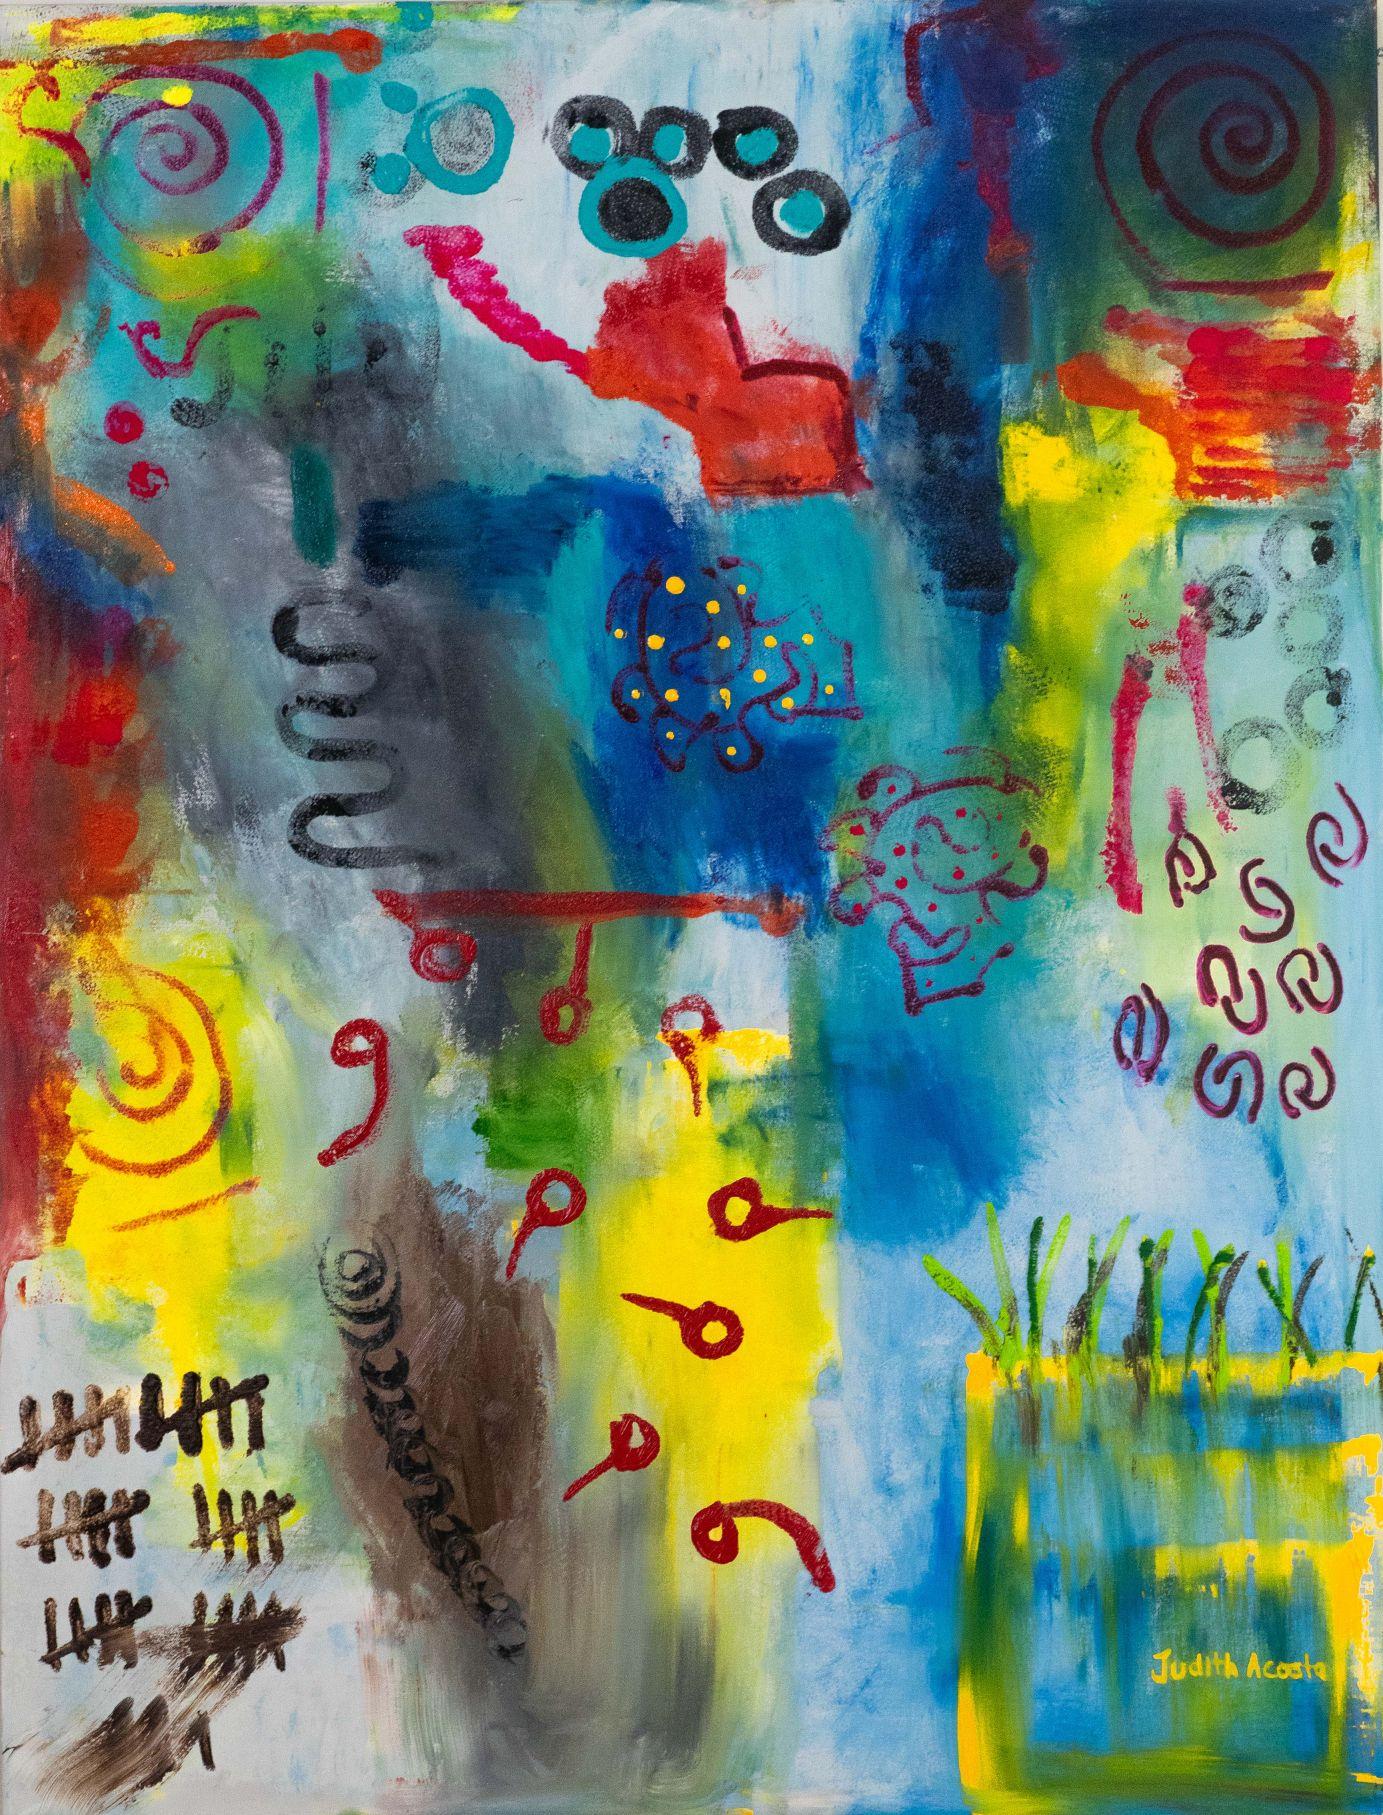 UNTITLED (2020) - Judith Acosta Bustamante